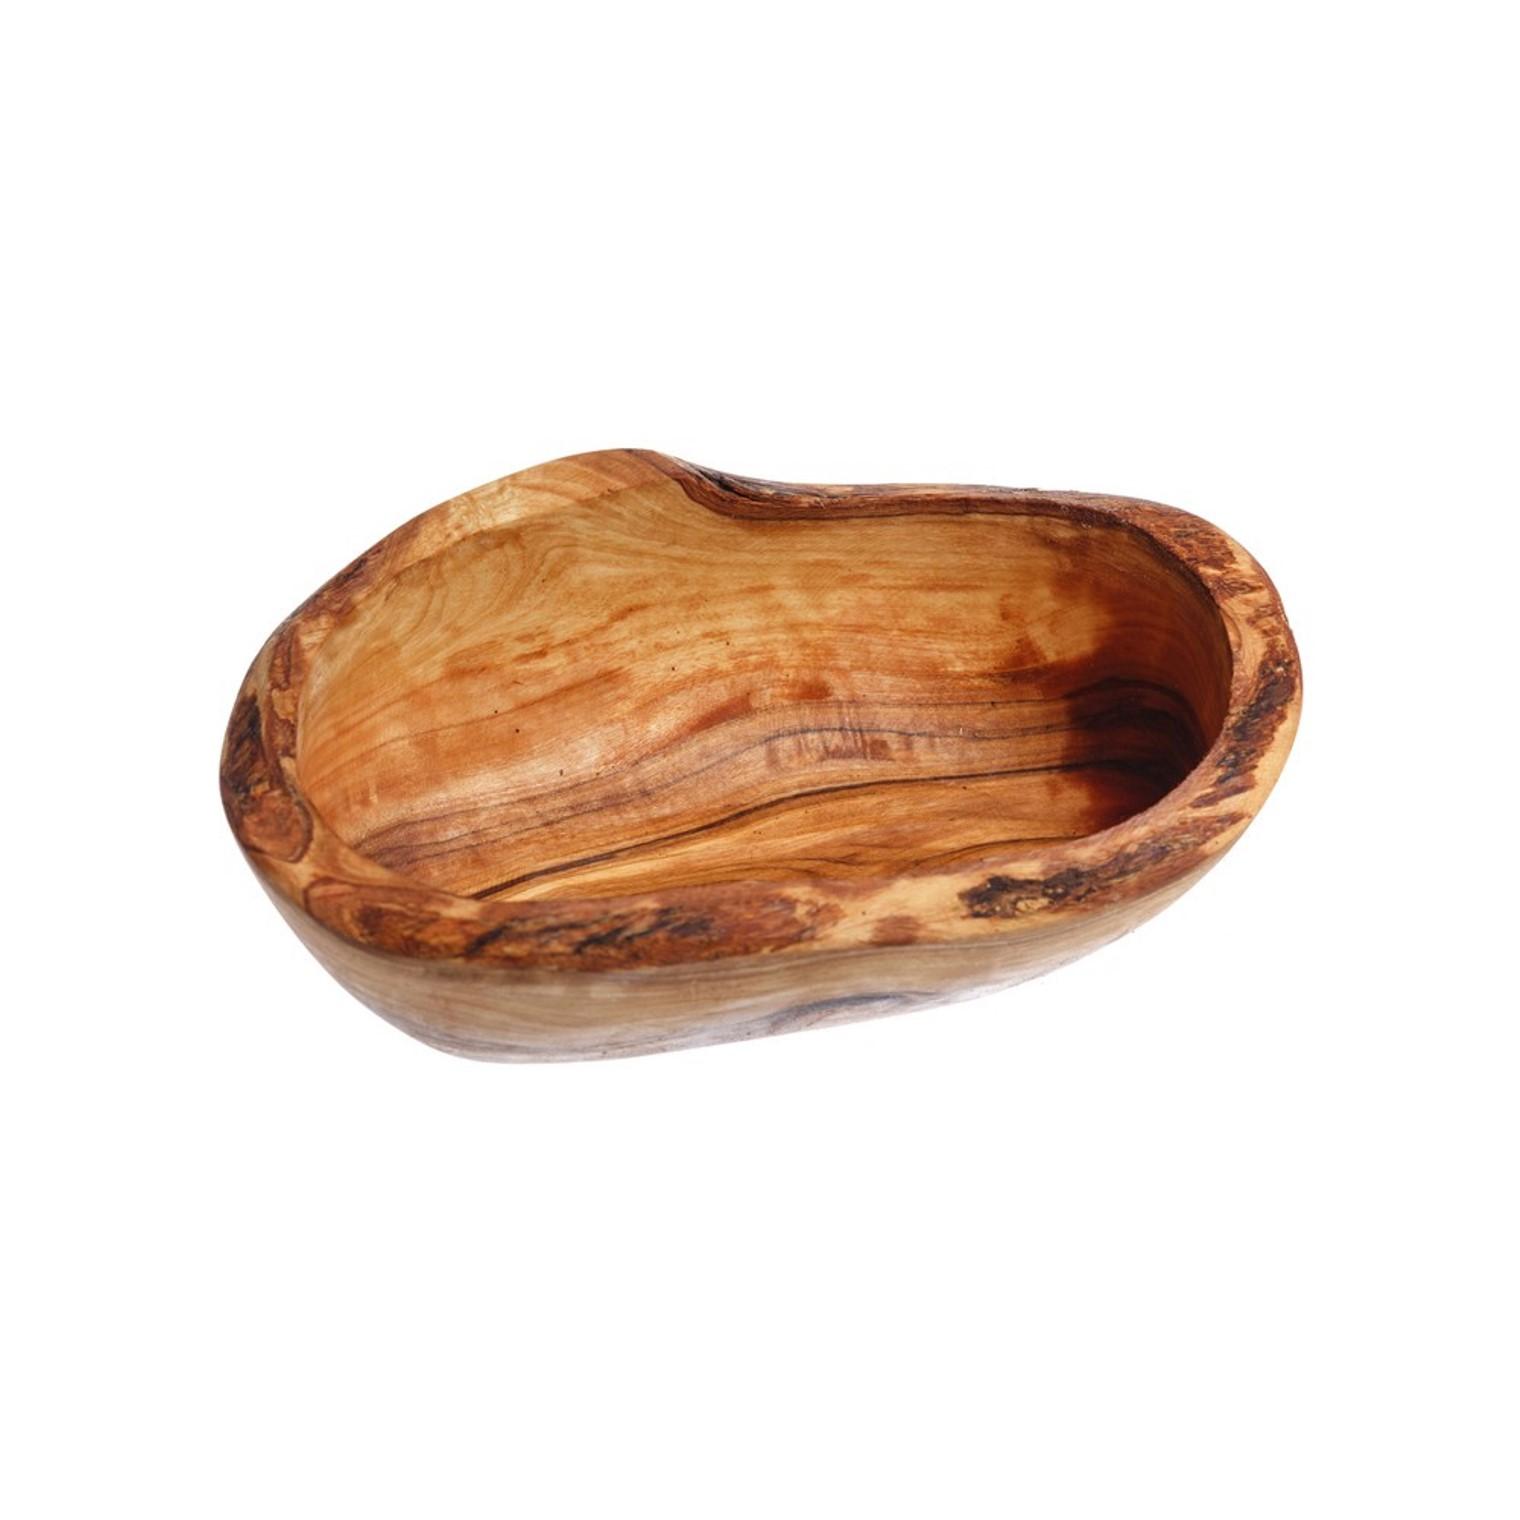 Онлайн каталог PROMENU: Пиала сервировочная для продуктов Just Slate, дерево, длина 14 см, бежевый                               NM/OL142